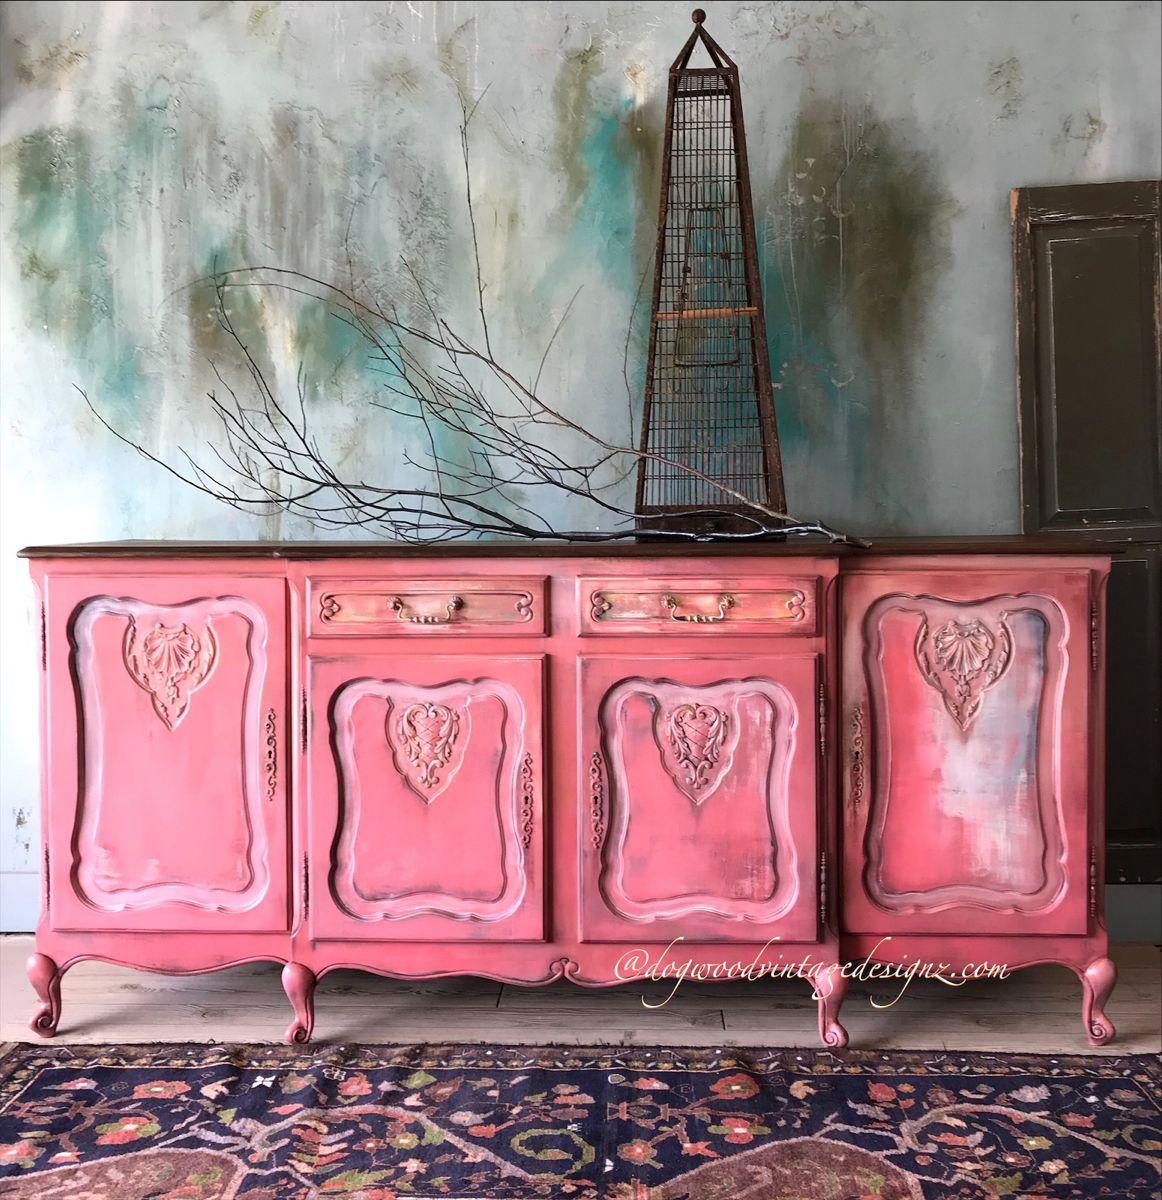 #furnitureartist #interiordesigner #diylove #beautifulhome #layered #vintage furniture #ilovetopaint #modern #romantic #mauve #moderndecor #retro #repurposedvintage #patina #bohoismyjam #bohoglam #furnitureflip #wiseowlpaint #anniesloanhome #pinkish #blush #beautifulhome #textured